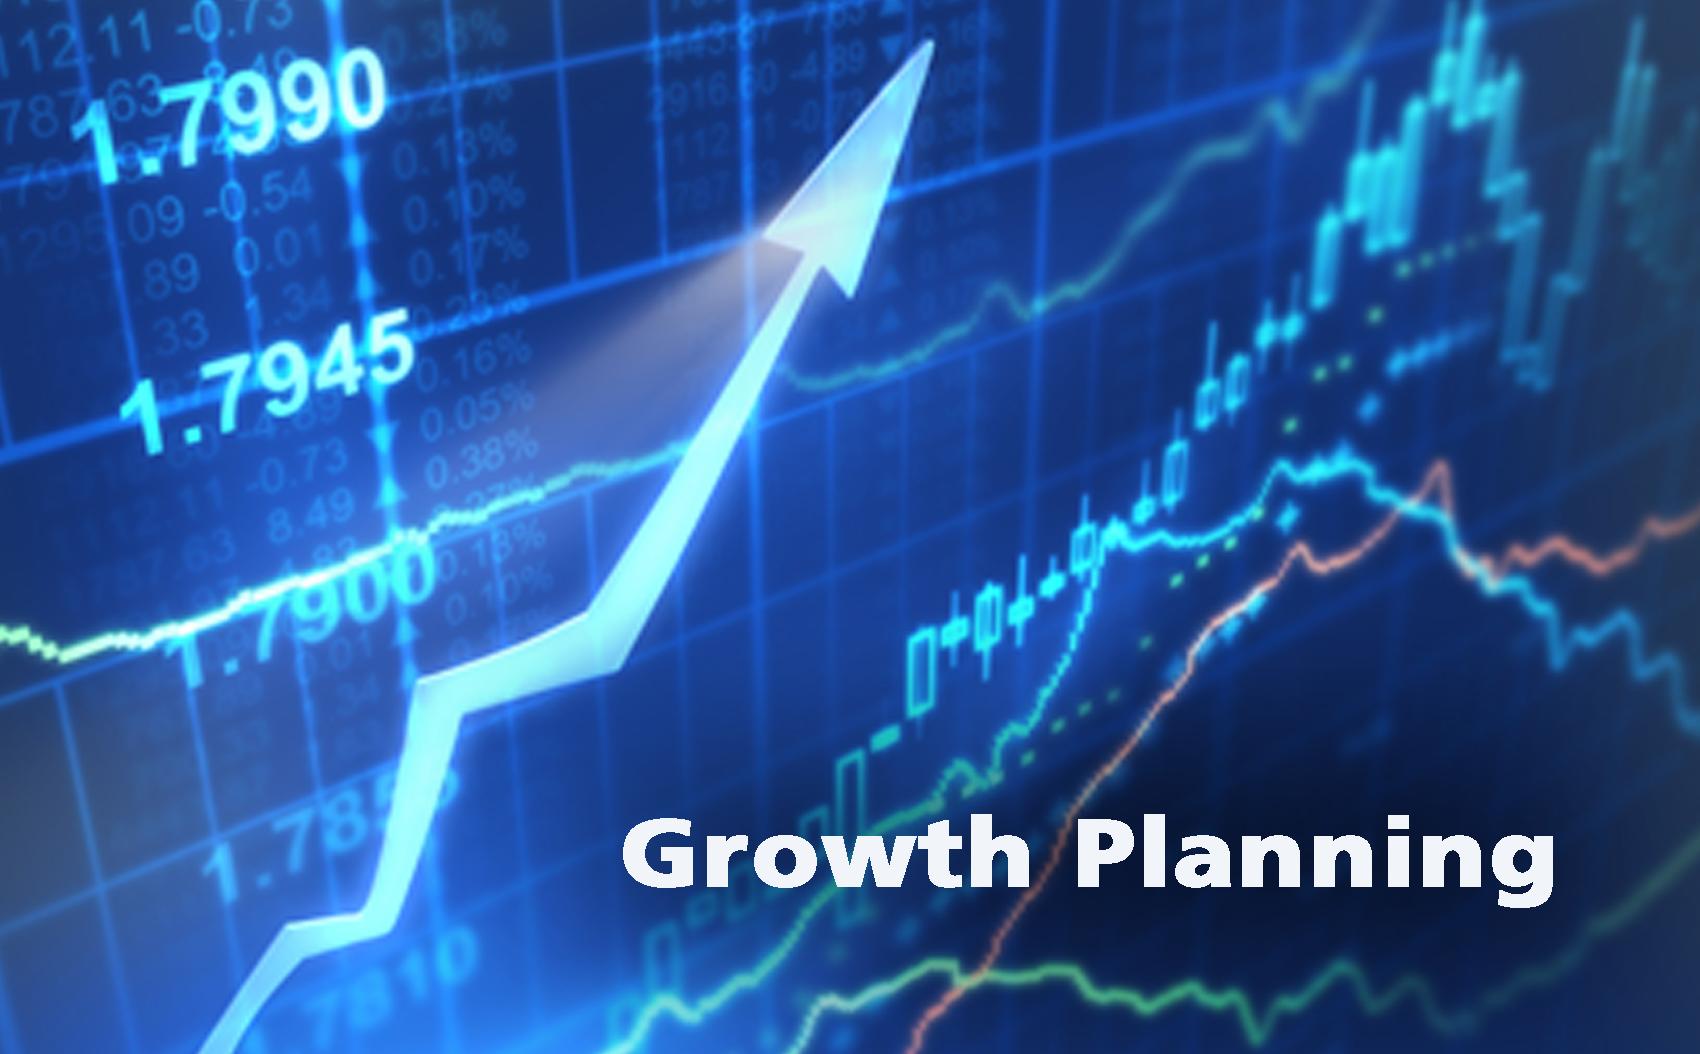 Growth Planning